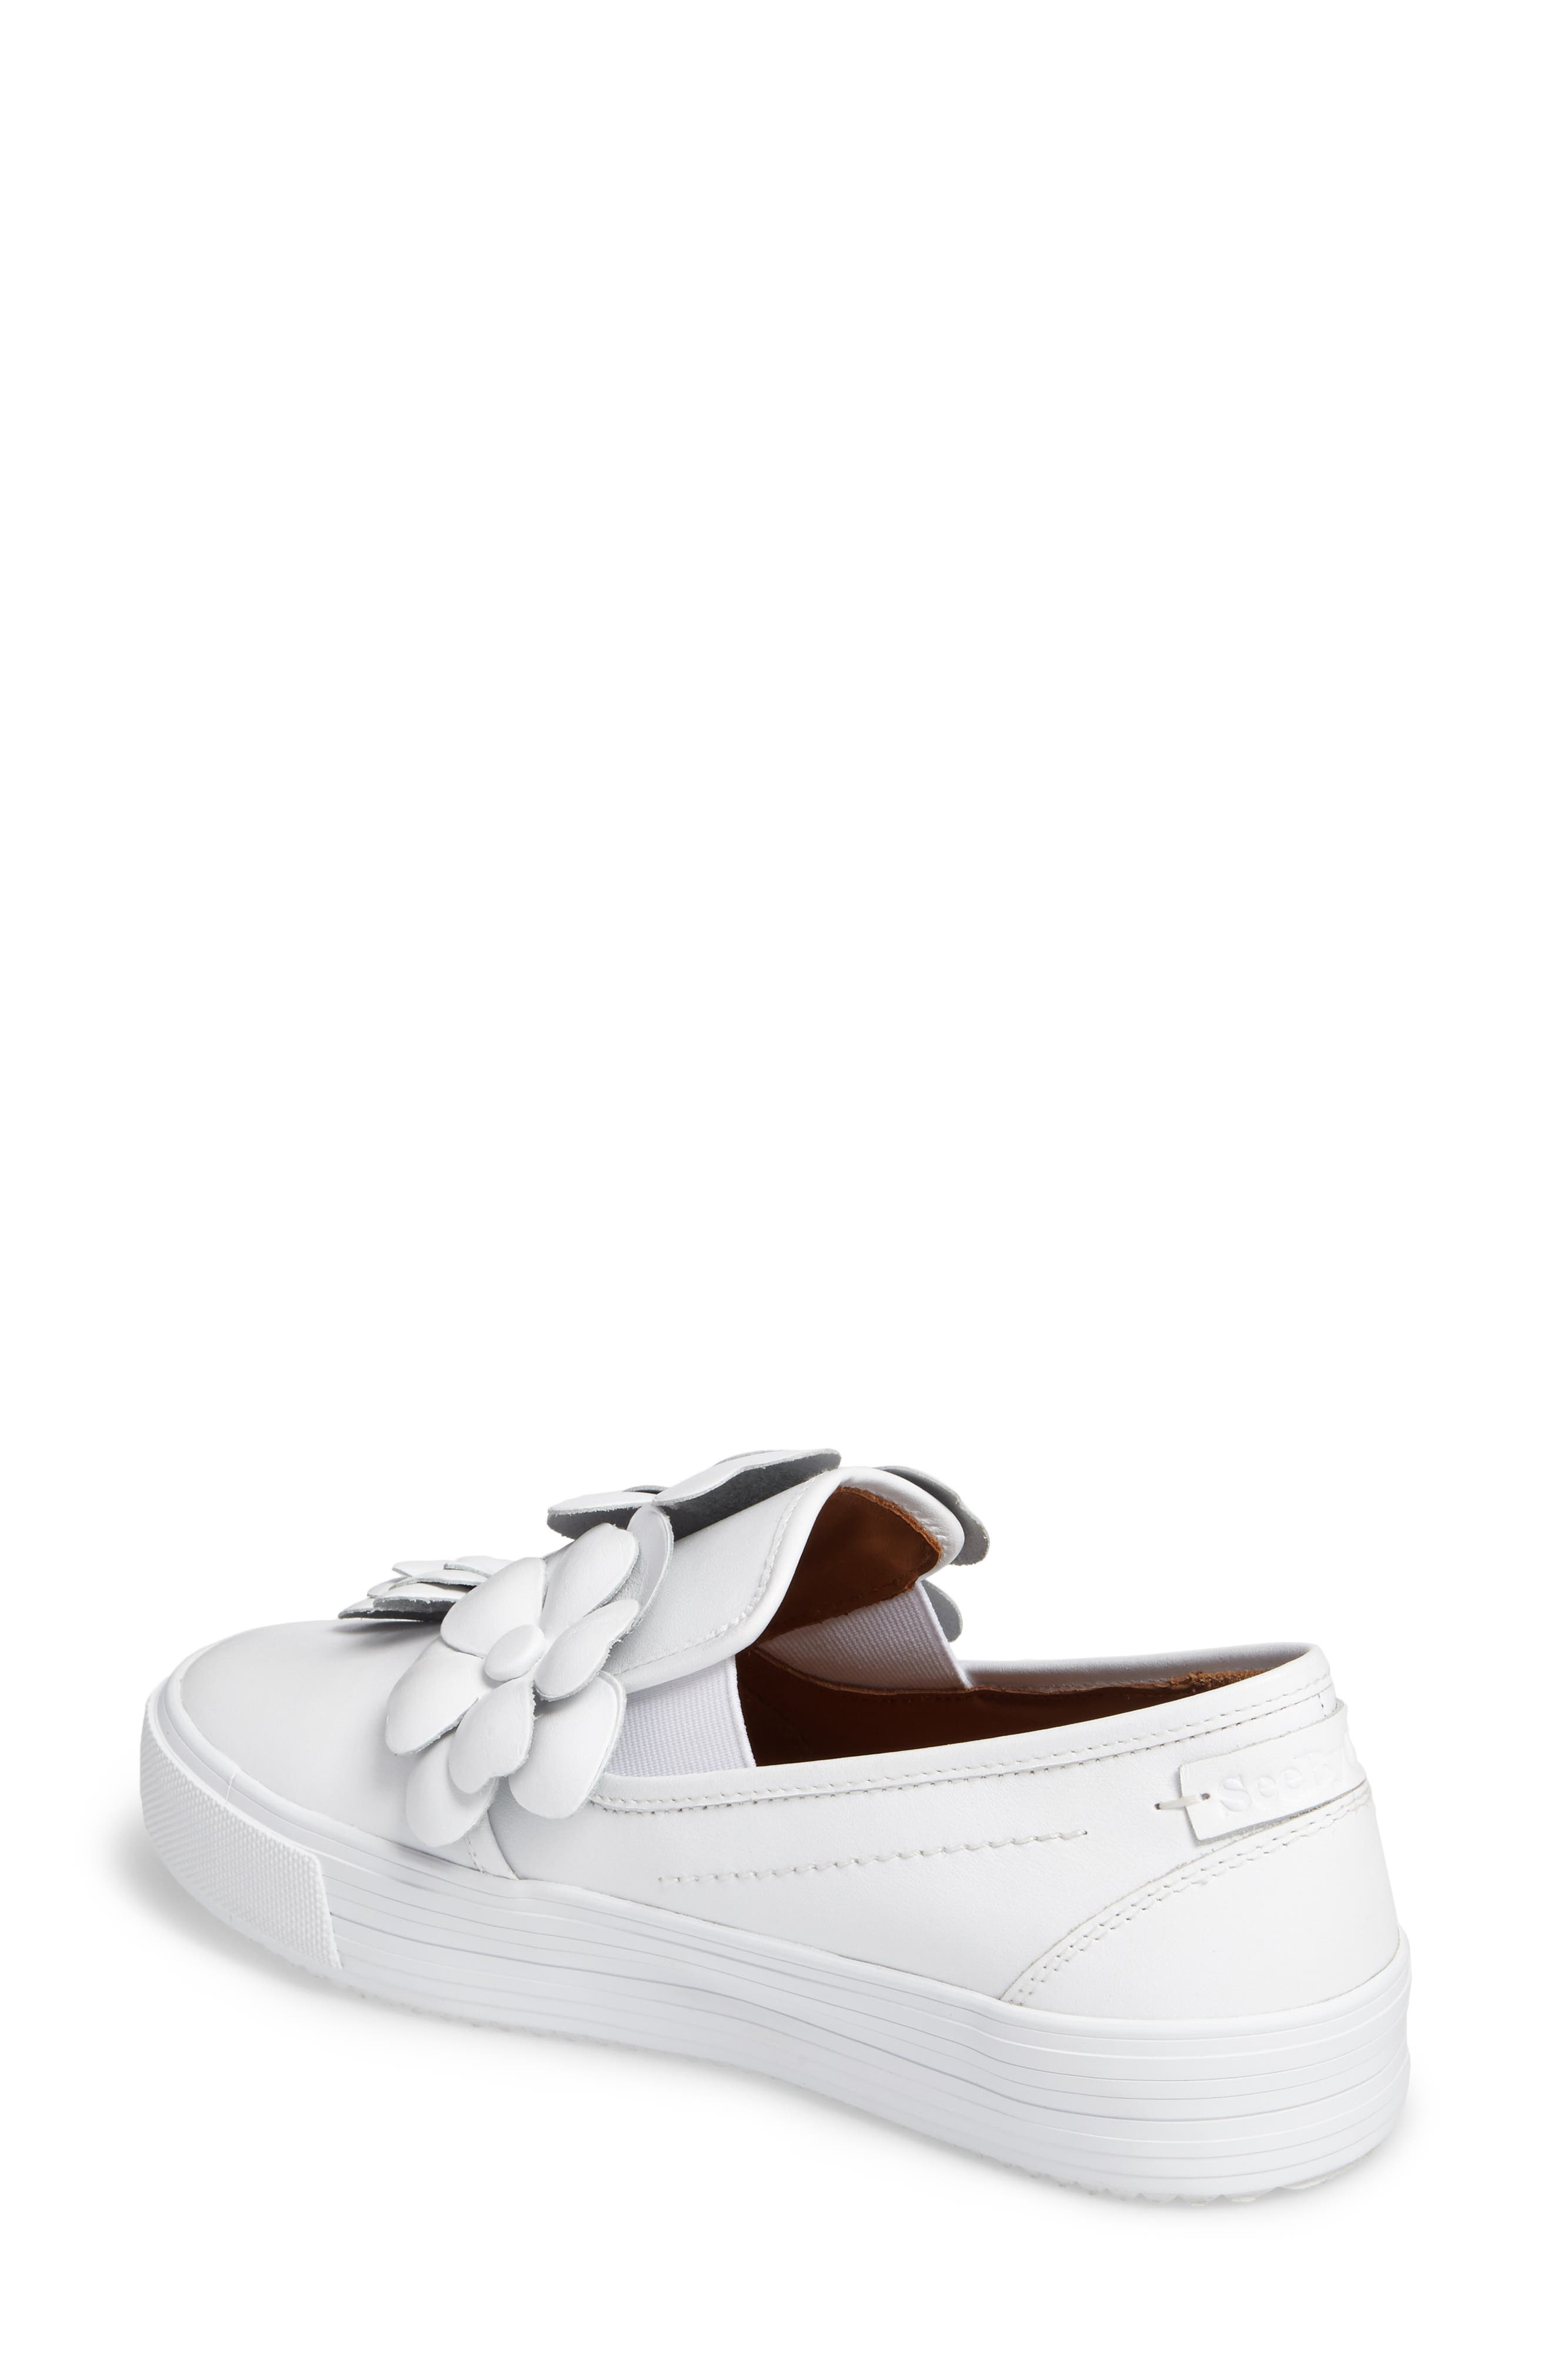 Alternate Image 2  - See by Chloé Vera Floral Appliqué Slip-On Sneaker (Women)